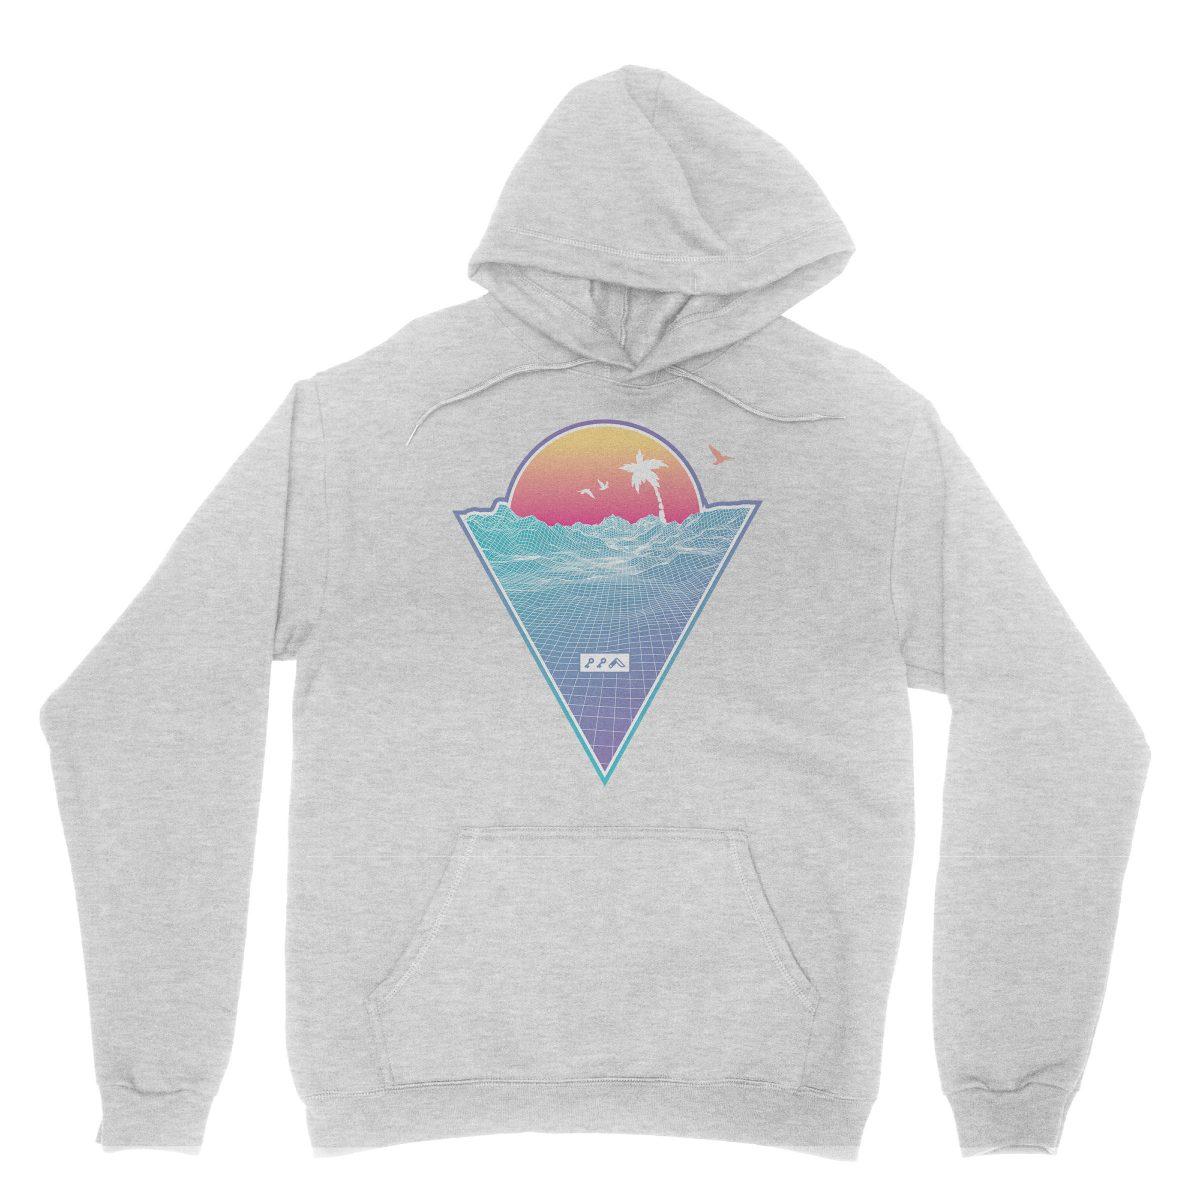 """OFF THE GRID"" cali vibes retro 80s design hoodie sweatshirts grey by kikicutt"